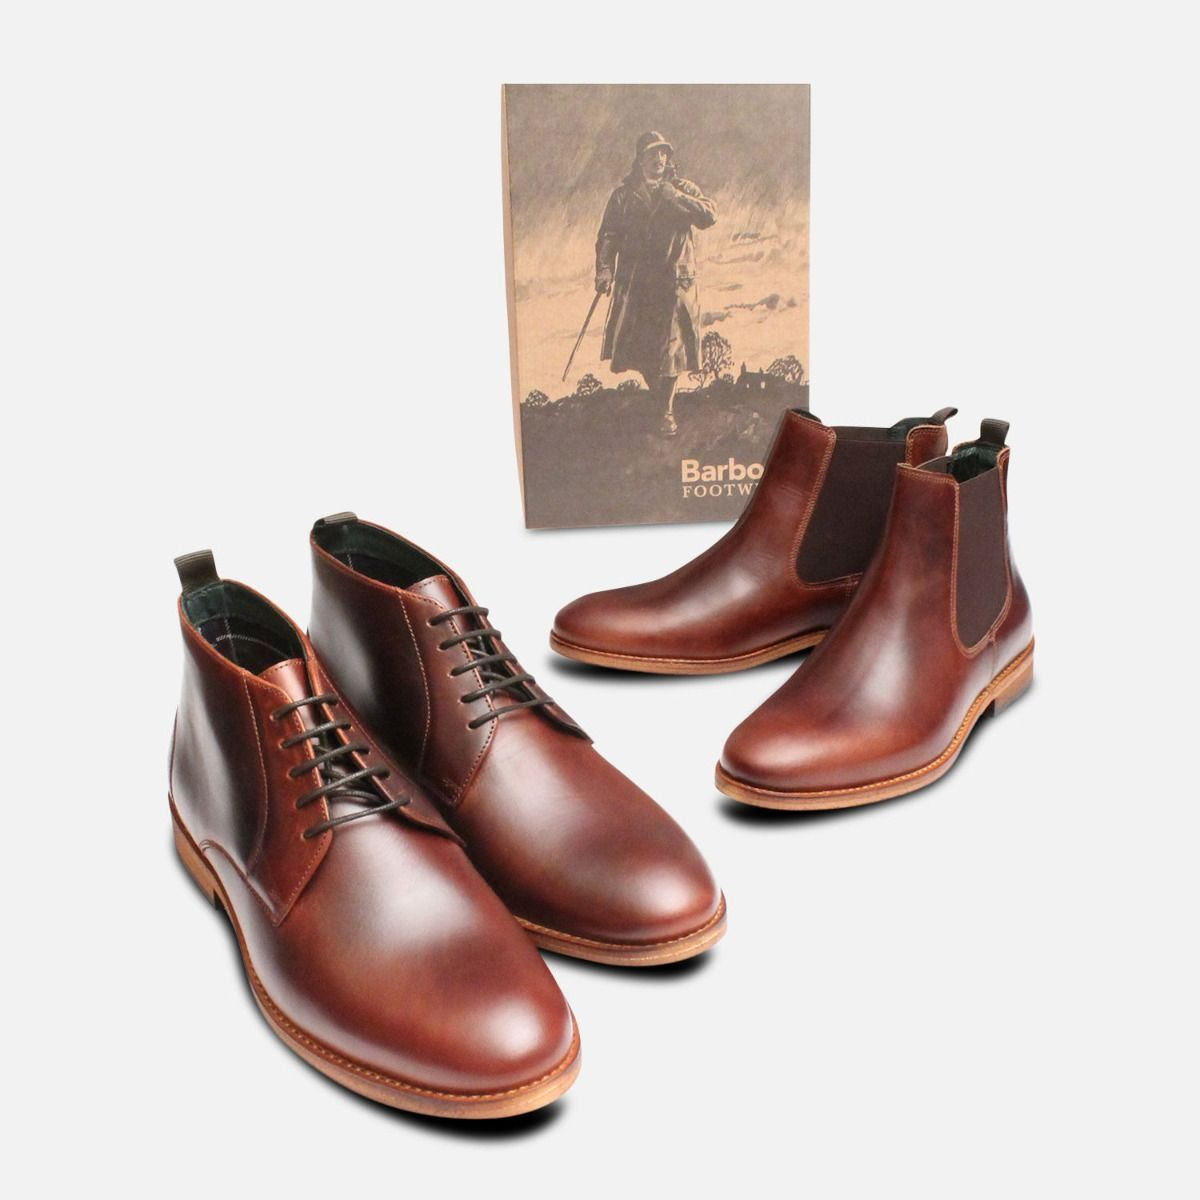 Barbour Waxy Brown Bedlington Chelsea Boots